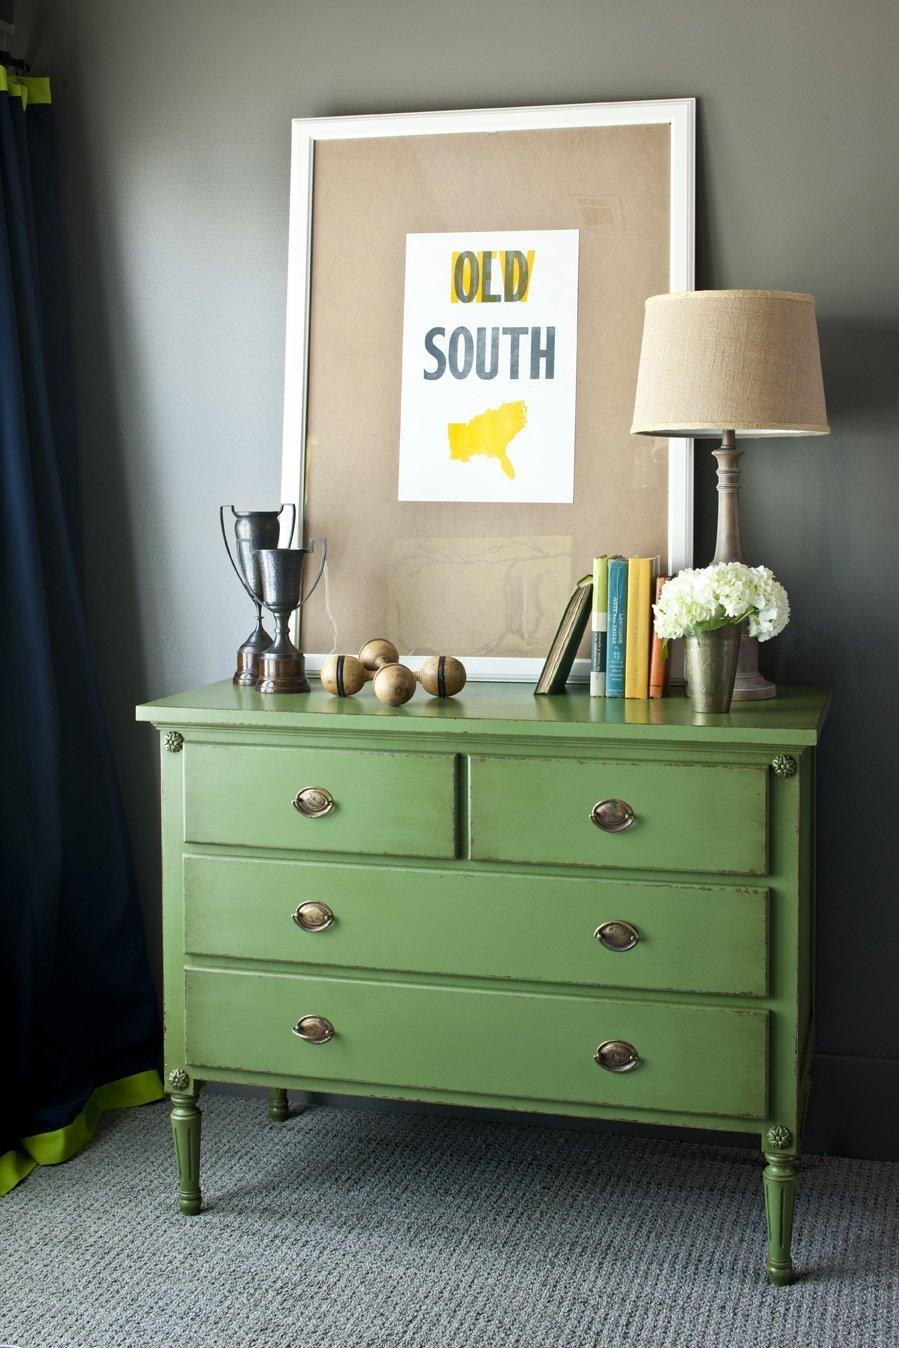 10 Cute Southern Living Idea House 2010 flash back southern living idea house with old try our blog